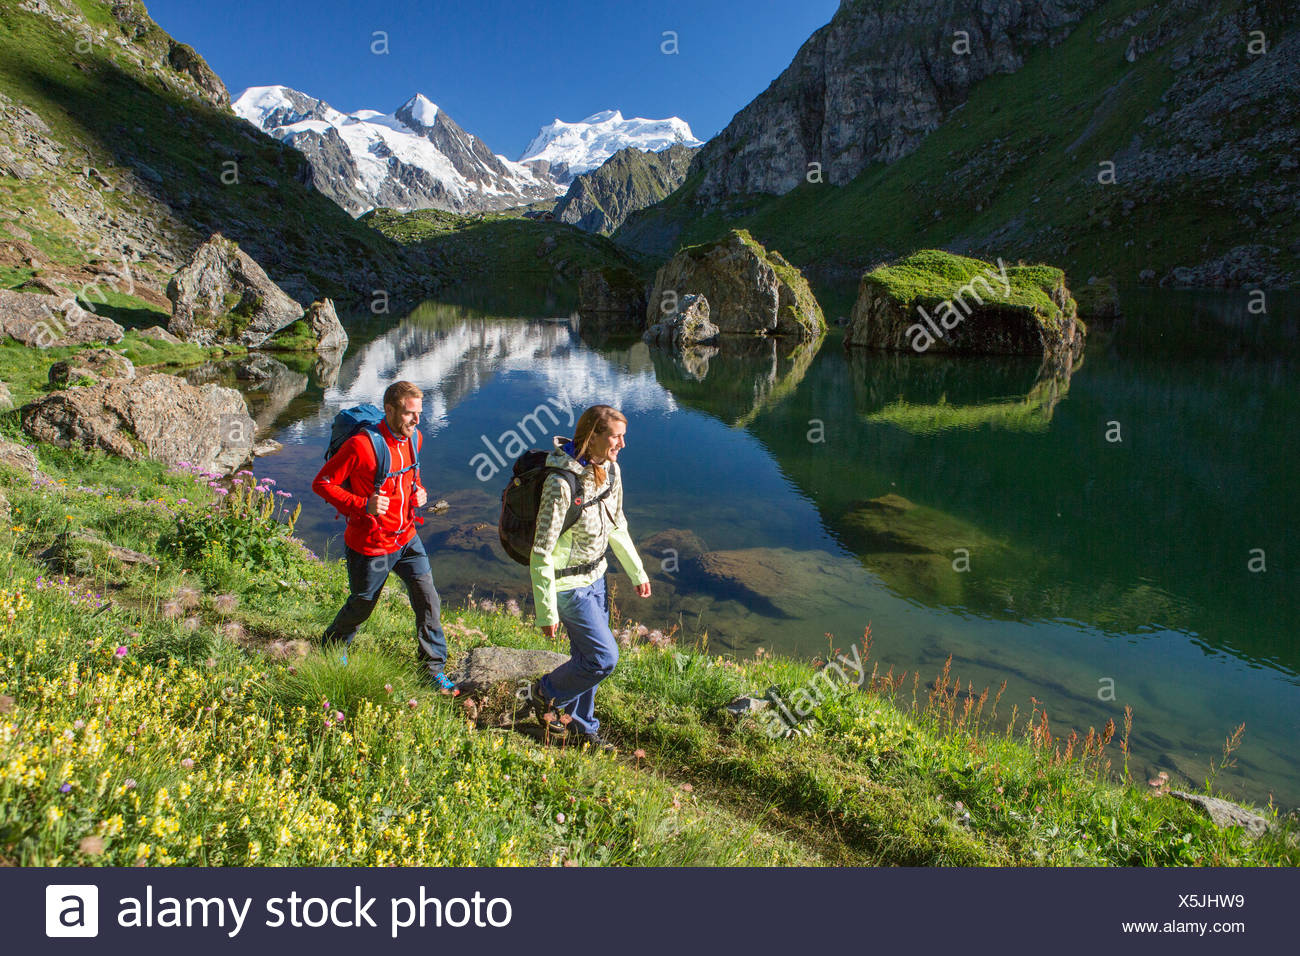 Switzerland Europe mountain mountains mountain lake couple walking hiking woman man two lake glacier ice Grand Combin Val of - Stock Image